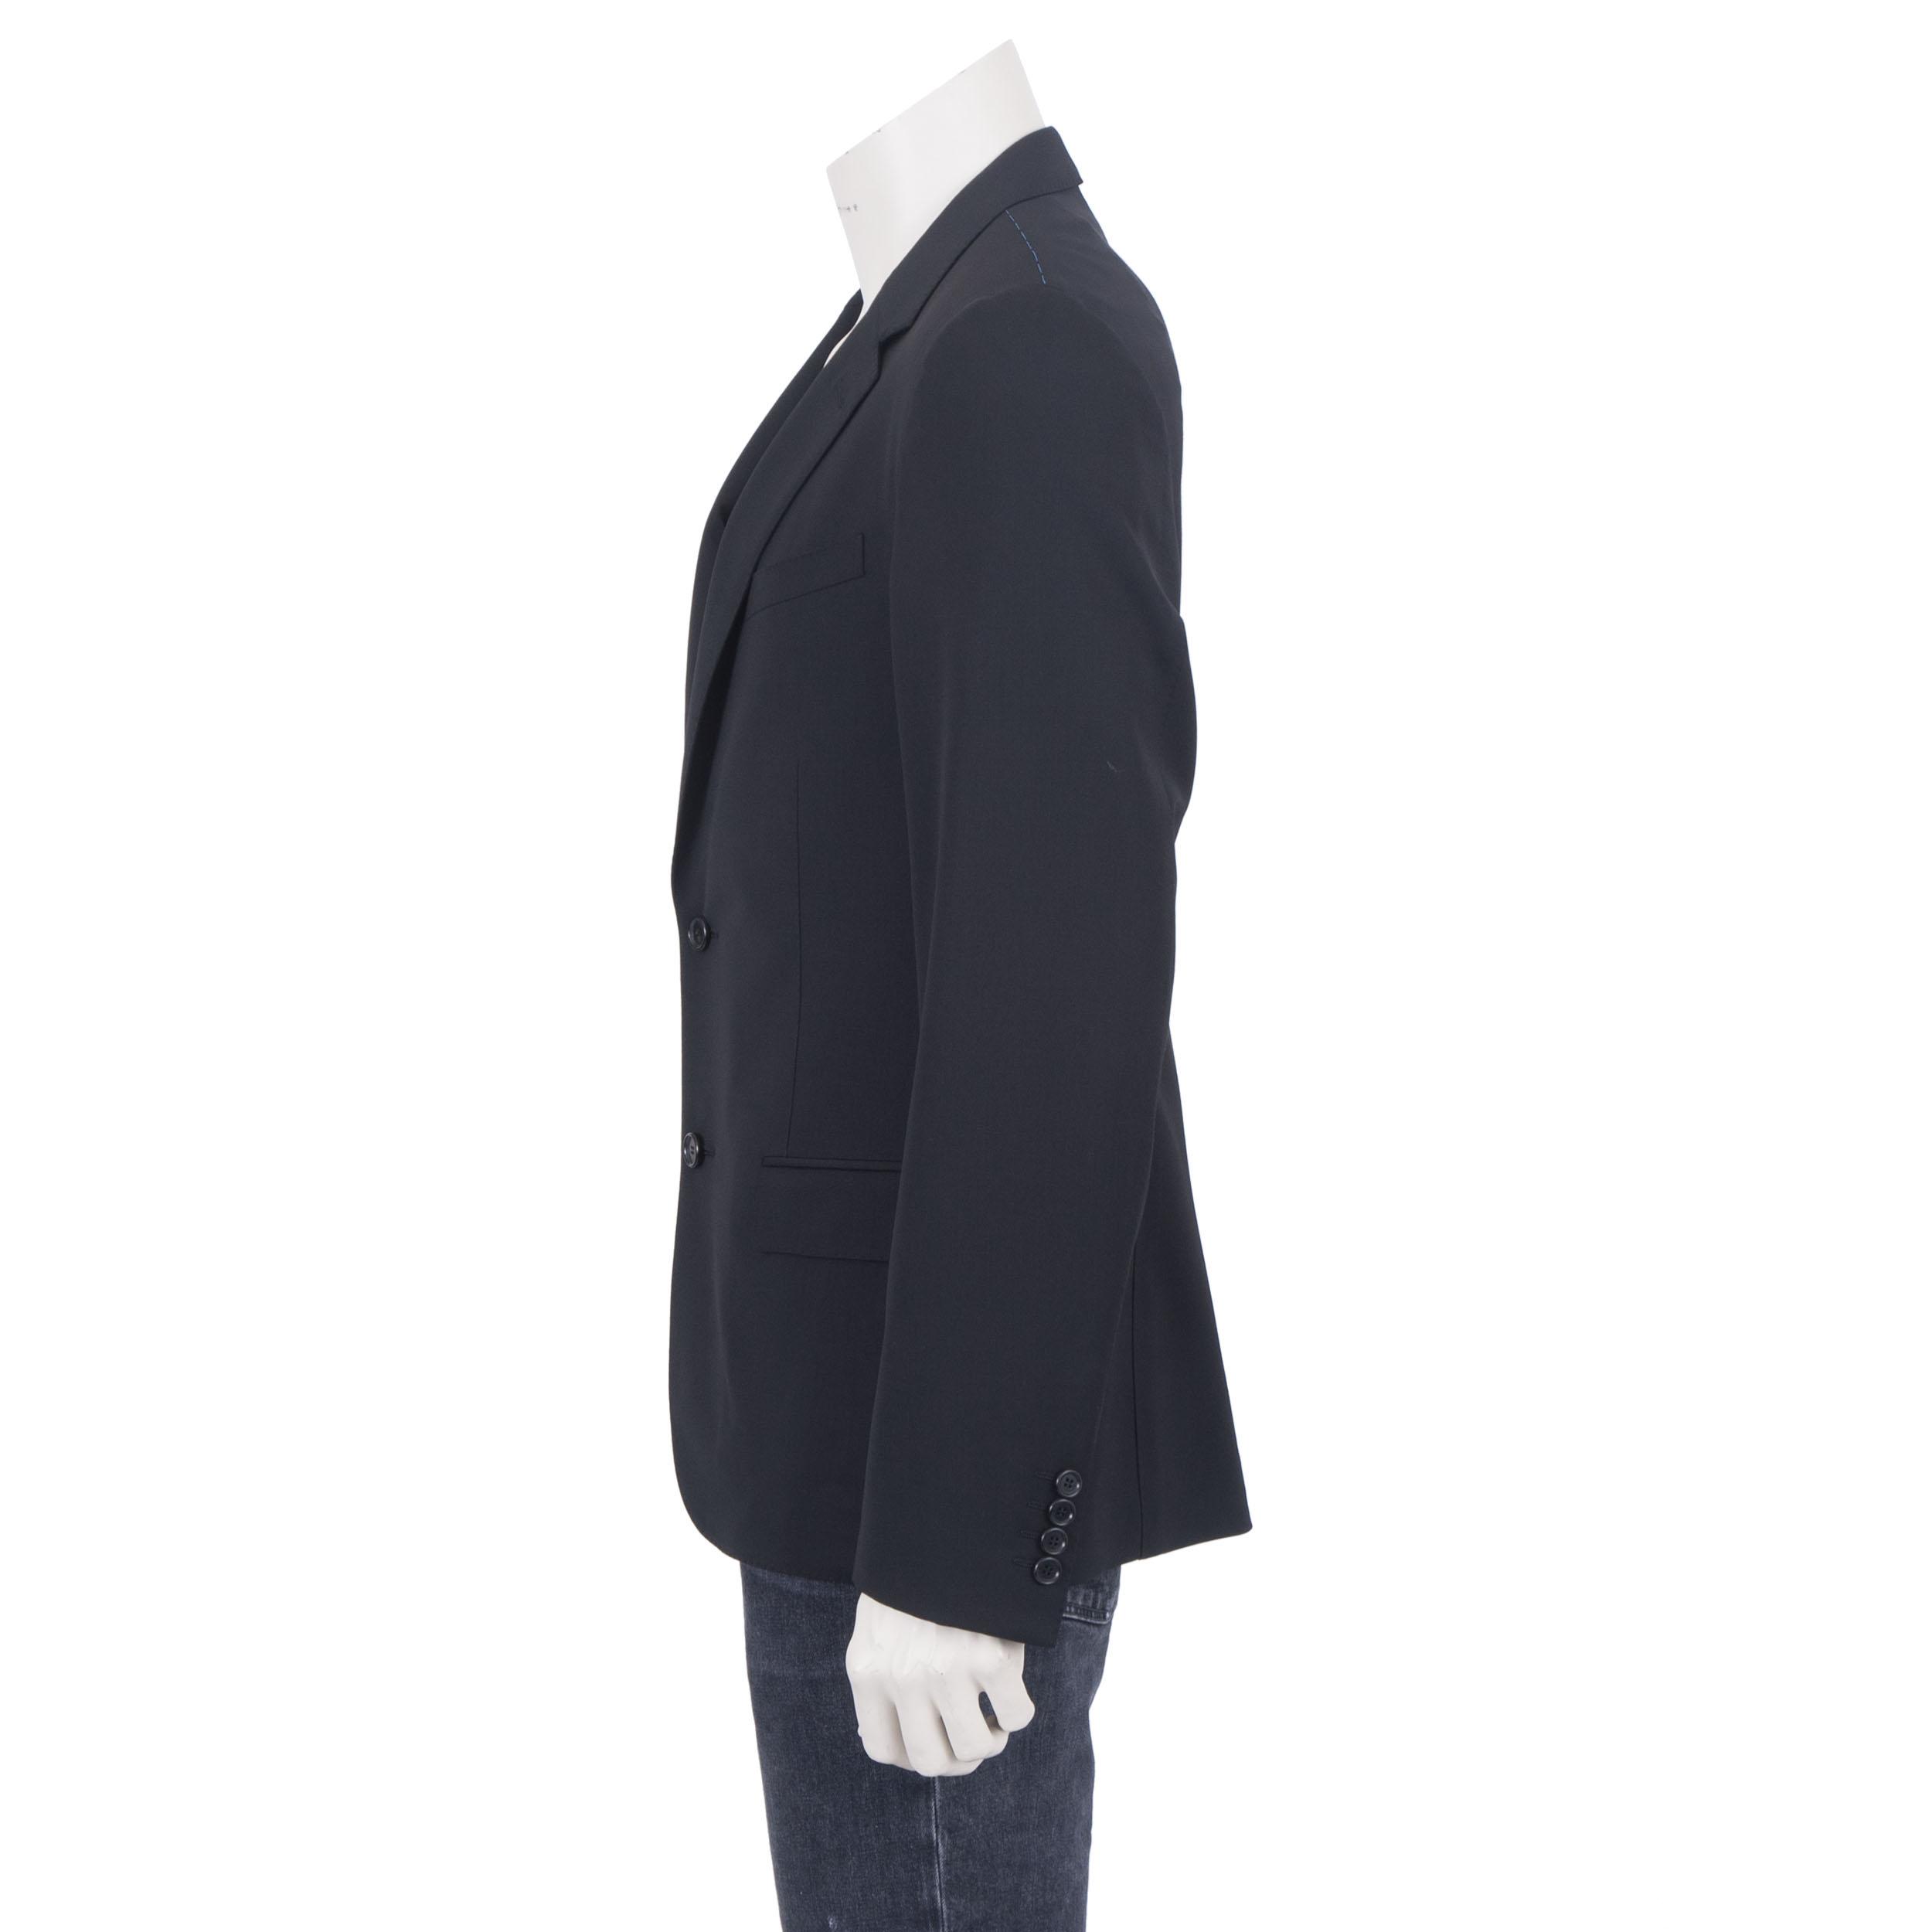 LANVIN 1950$ Authentic New Navy Blue Wool Lightweight Tailored Blazer Jacket